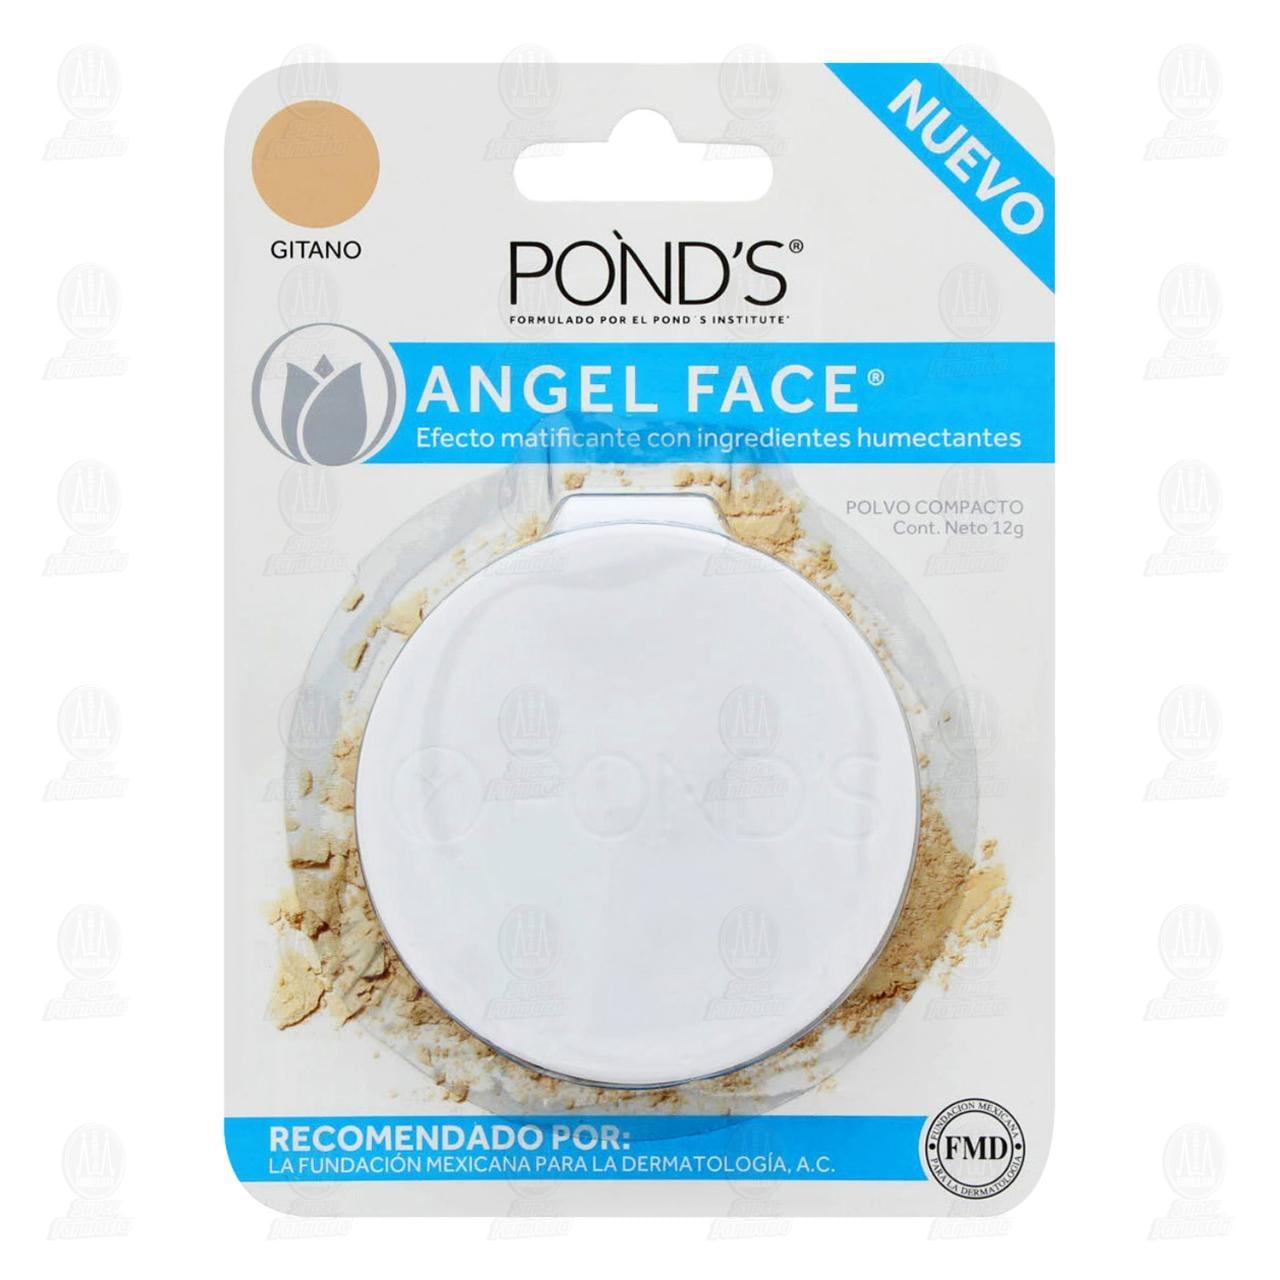 Maquillaje en Polvo Pond's Angel Face Color Gitano, 12 gr.